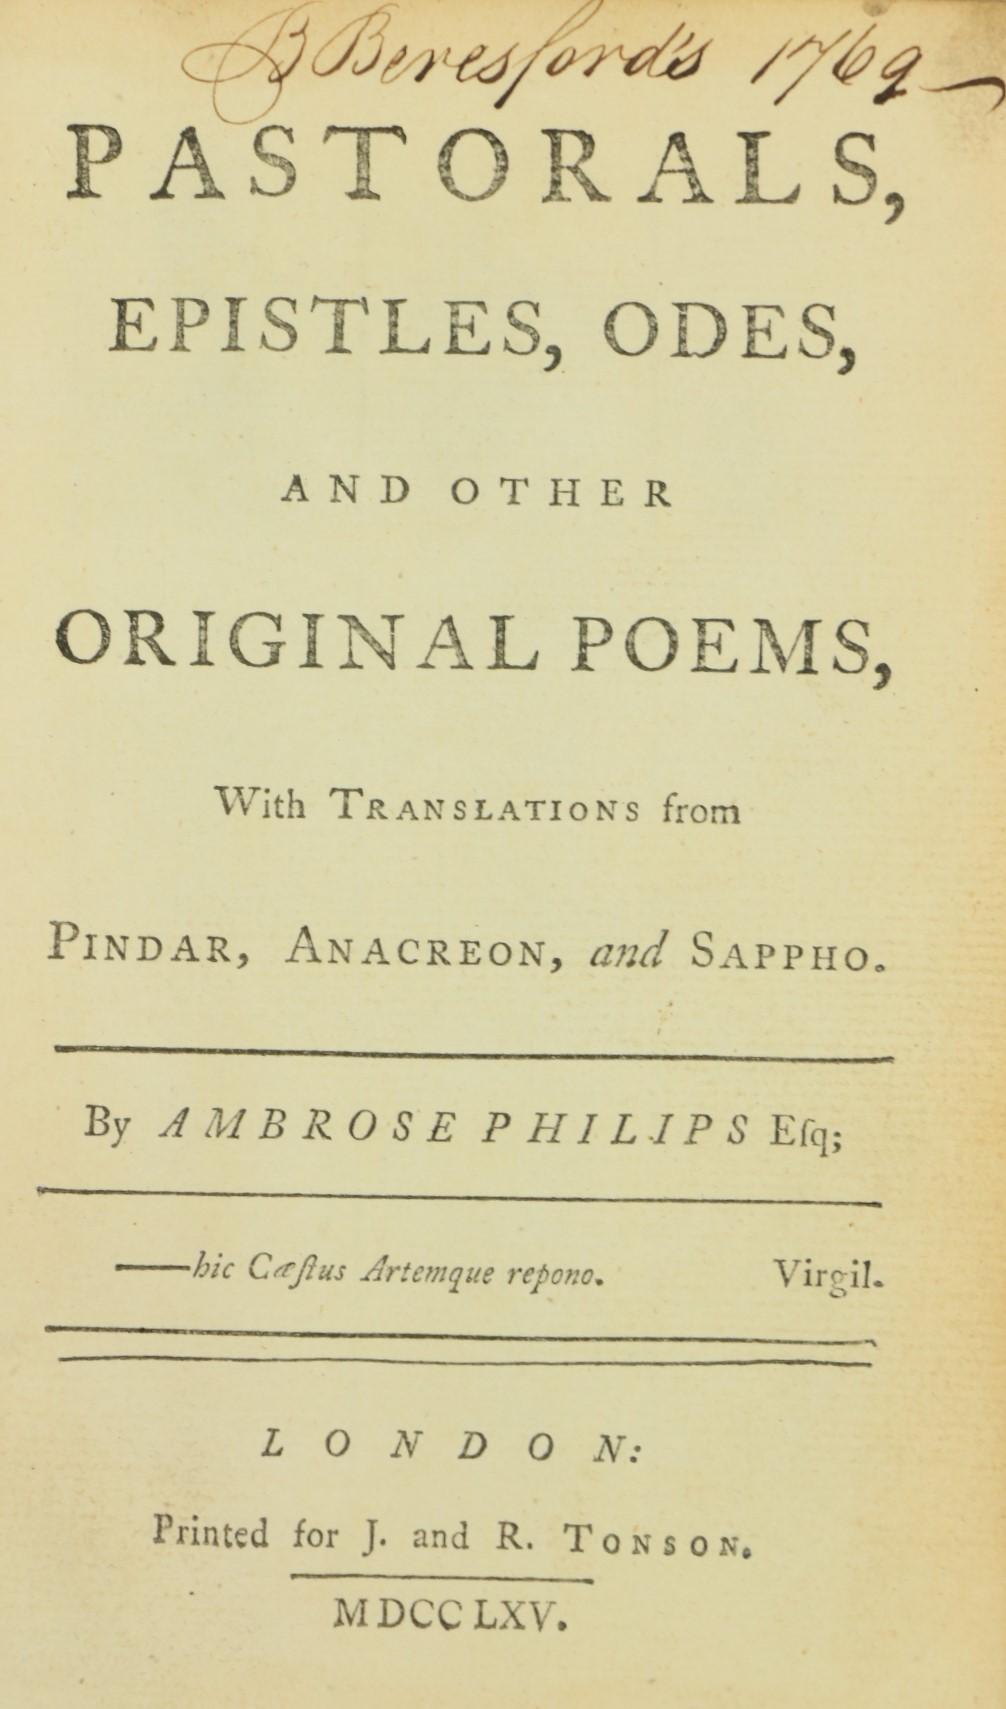 [Brydges (Thos.)]ÿA Burlesque Translationÿof Homer, 2 vols. 12mo L. 1770.ÿThird Edn.,ÿ2 engd. - Image 2 of 4